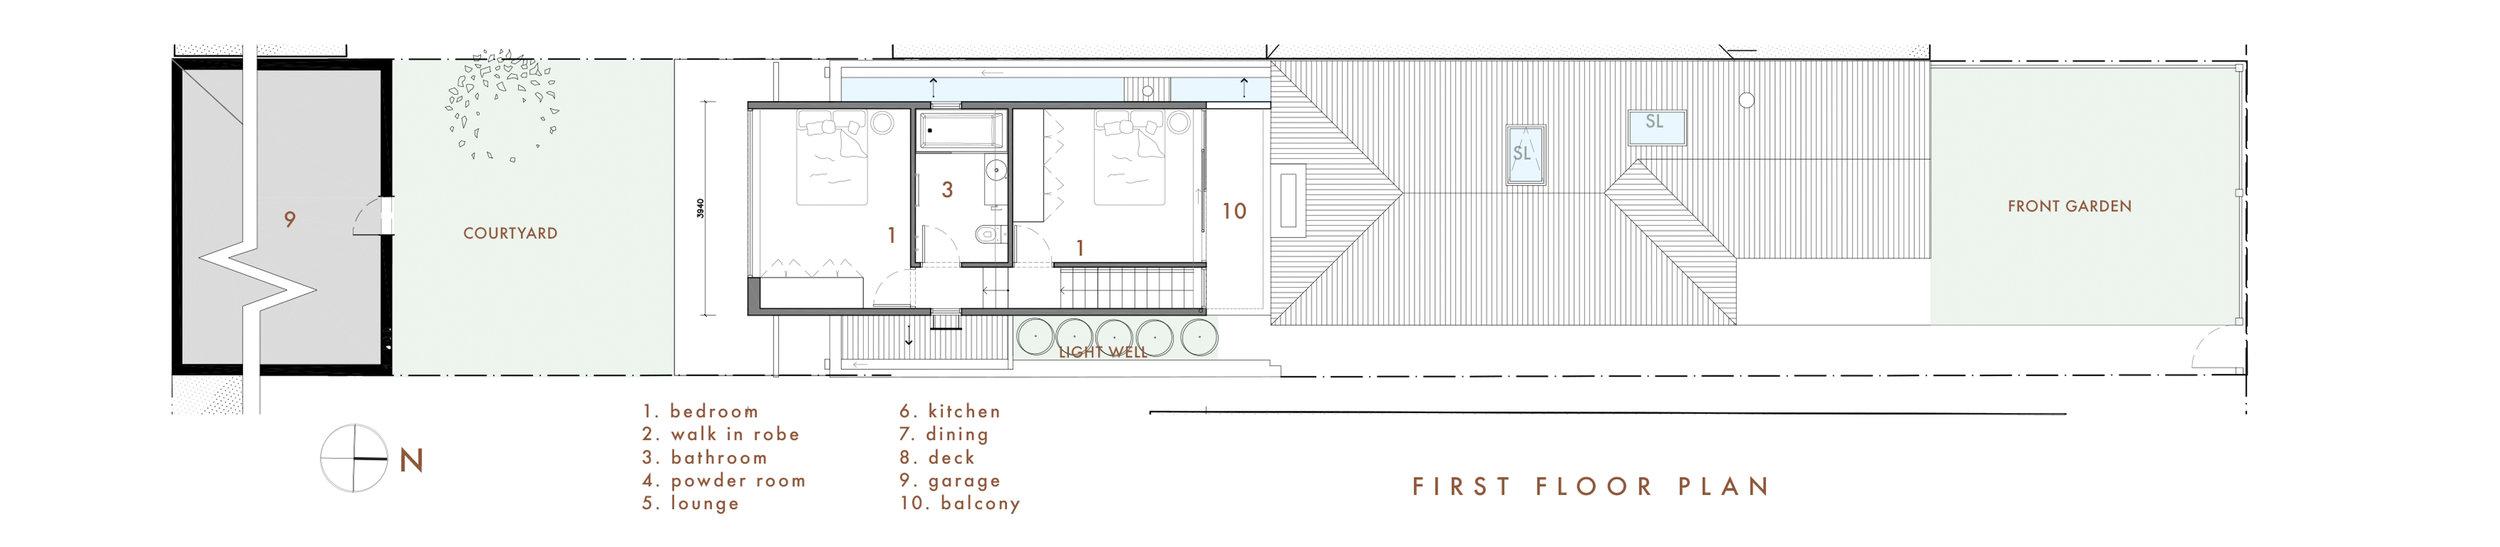 perched-house-rara-architect-the-design-emotive-17.jpg